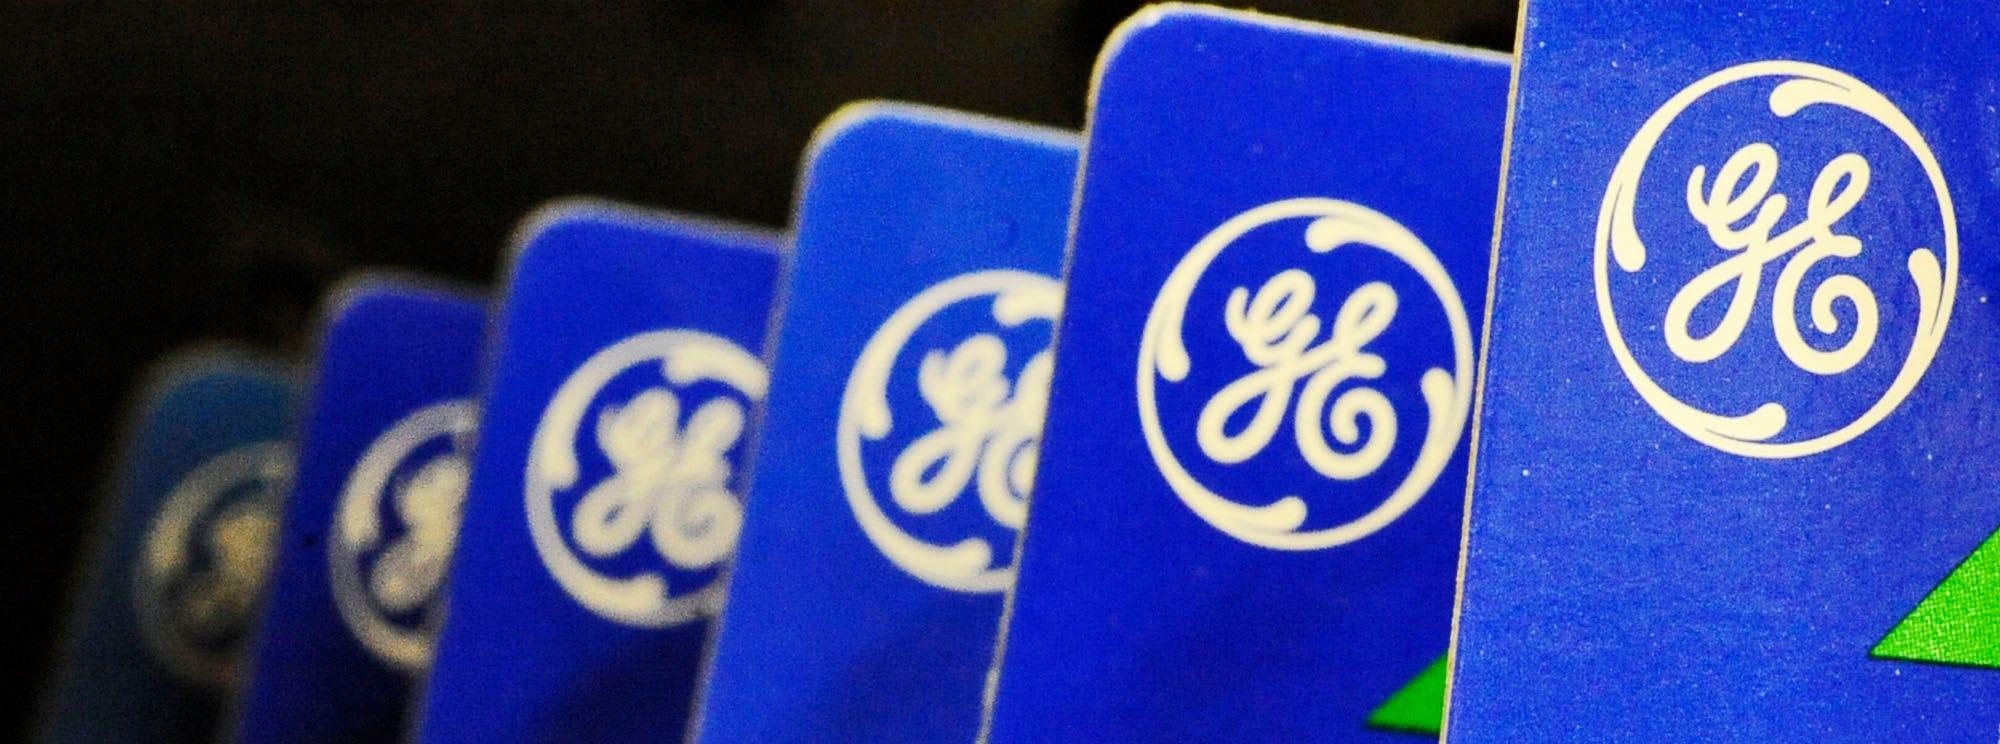 GE dismantles GE Capital; plans $90B to investors